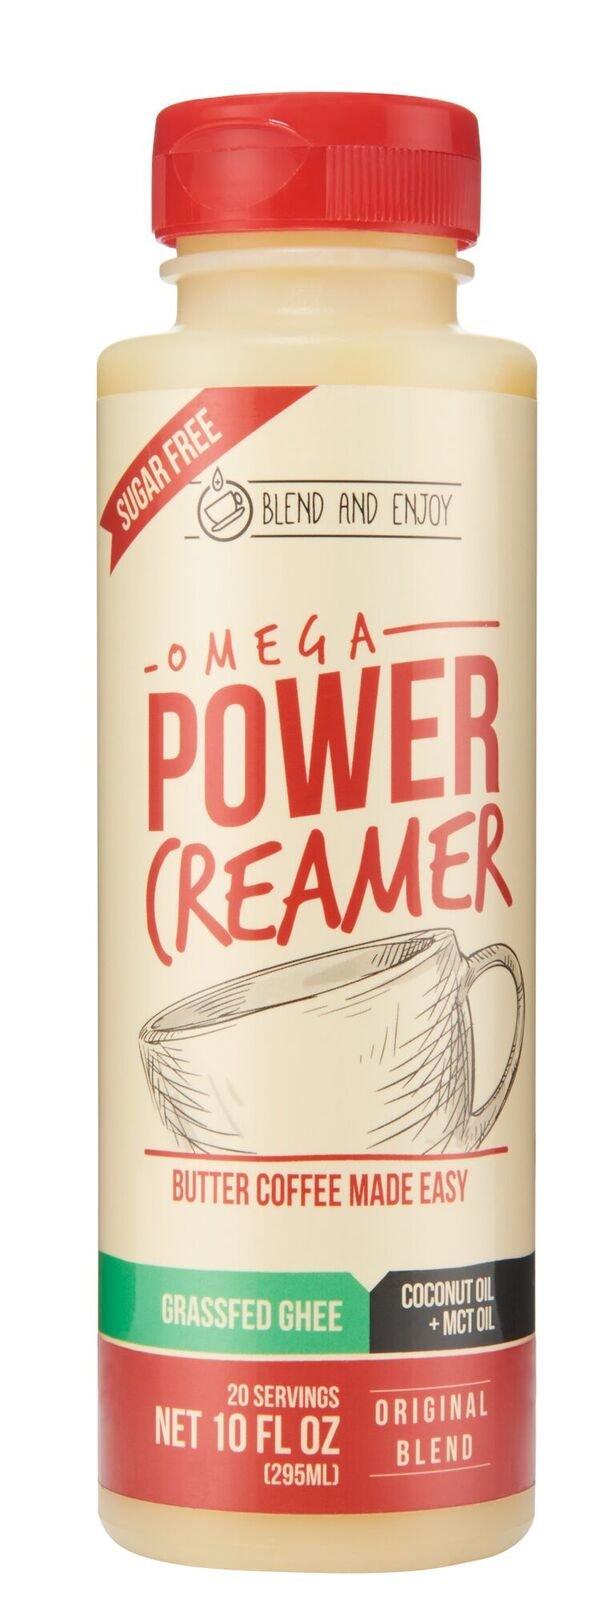 Omega PowerCreamer - Made with Grass-fed Organic Ghee, Organic Coconut Oil, MCT Oil 100% C8/C10 | Premium Butter Coffee Blend | keto, paleo, sugar free, 10 fl oz (20 servings)